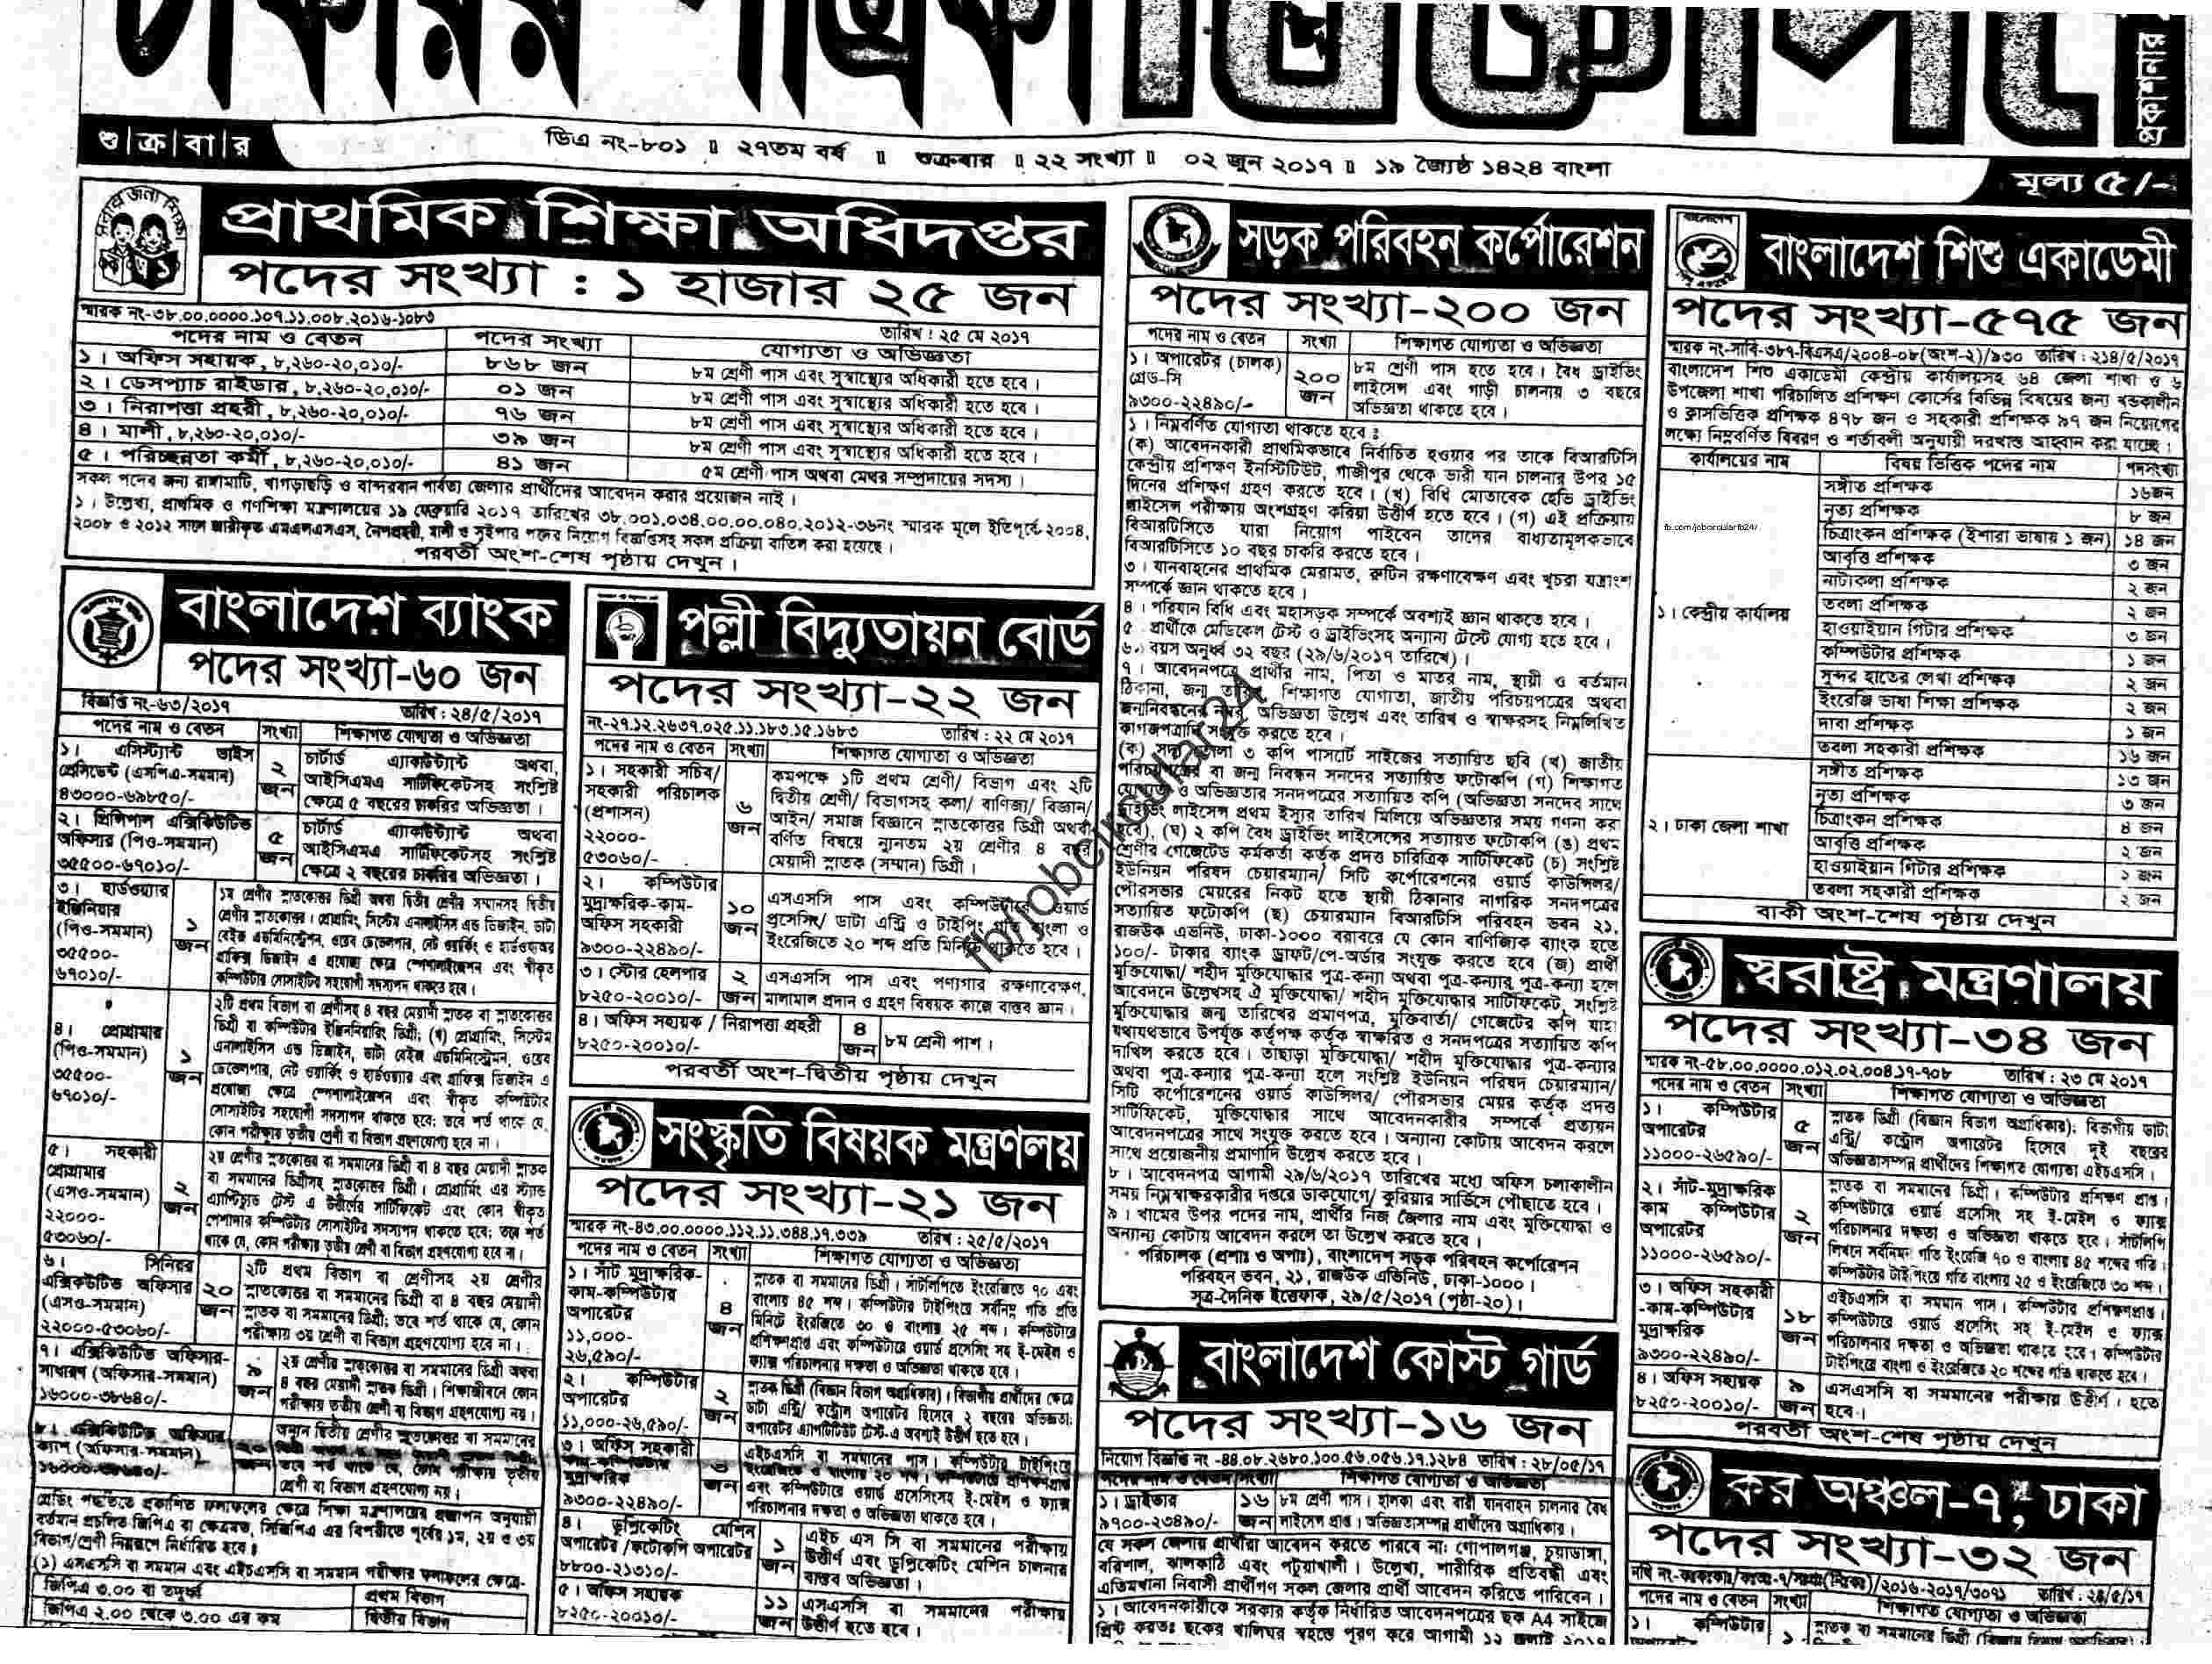 Weekly Job Newspaper 2 Jun 2017